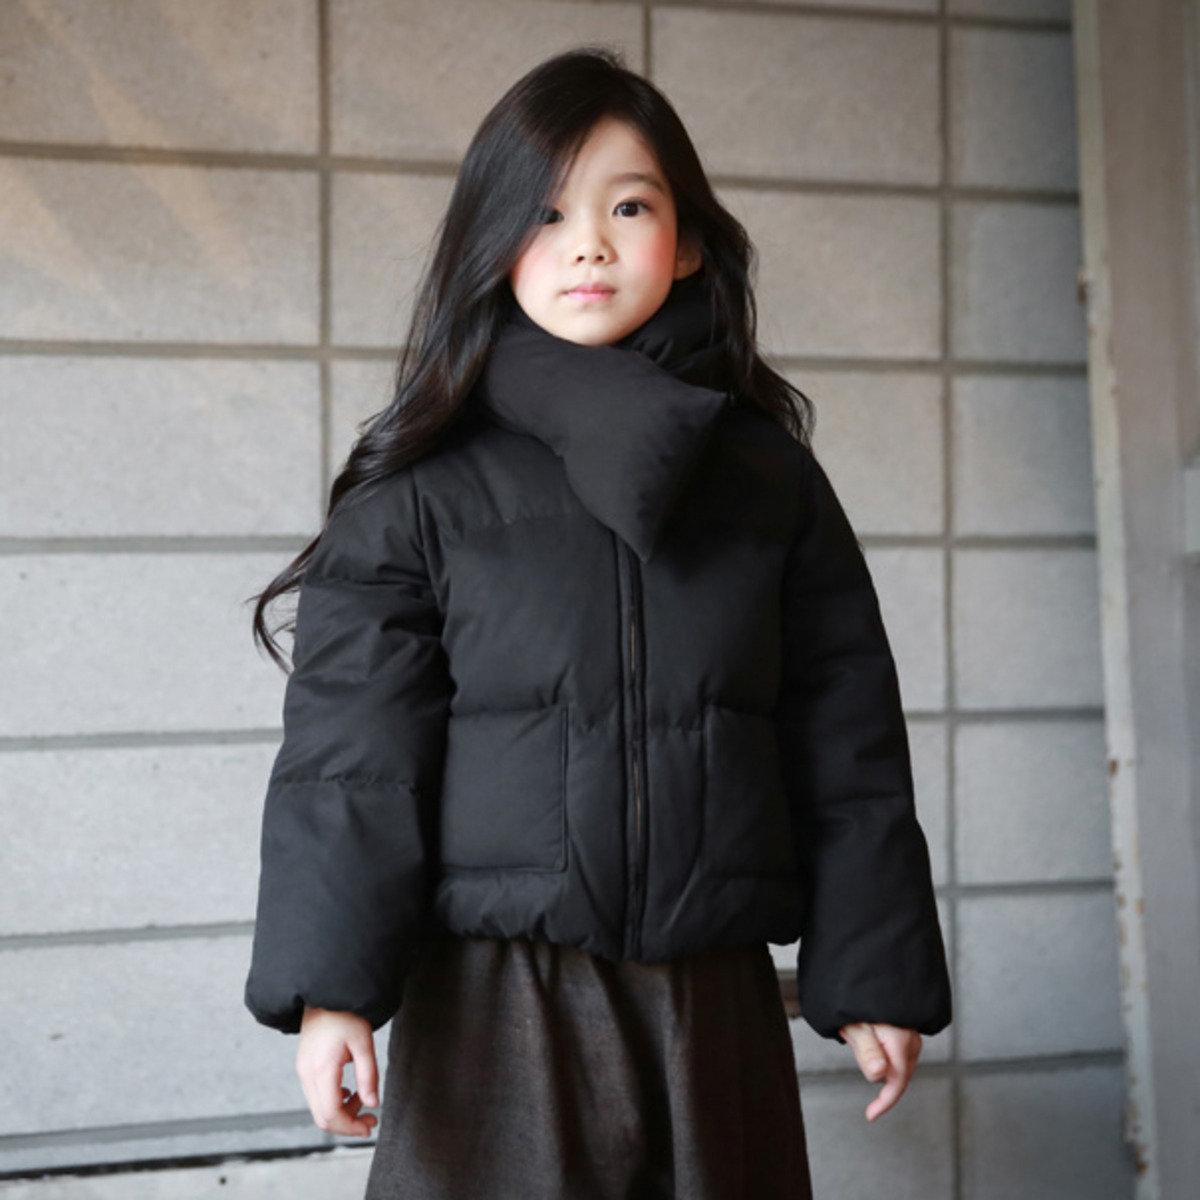 [15 W] 拉鏈羽絨外套_黑色(可配母子裝)_S60293